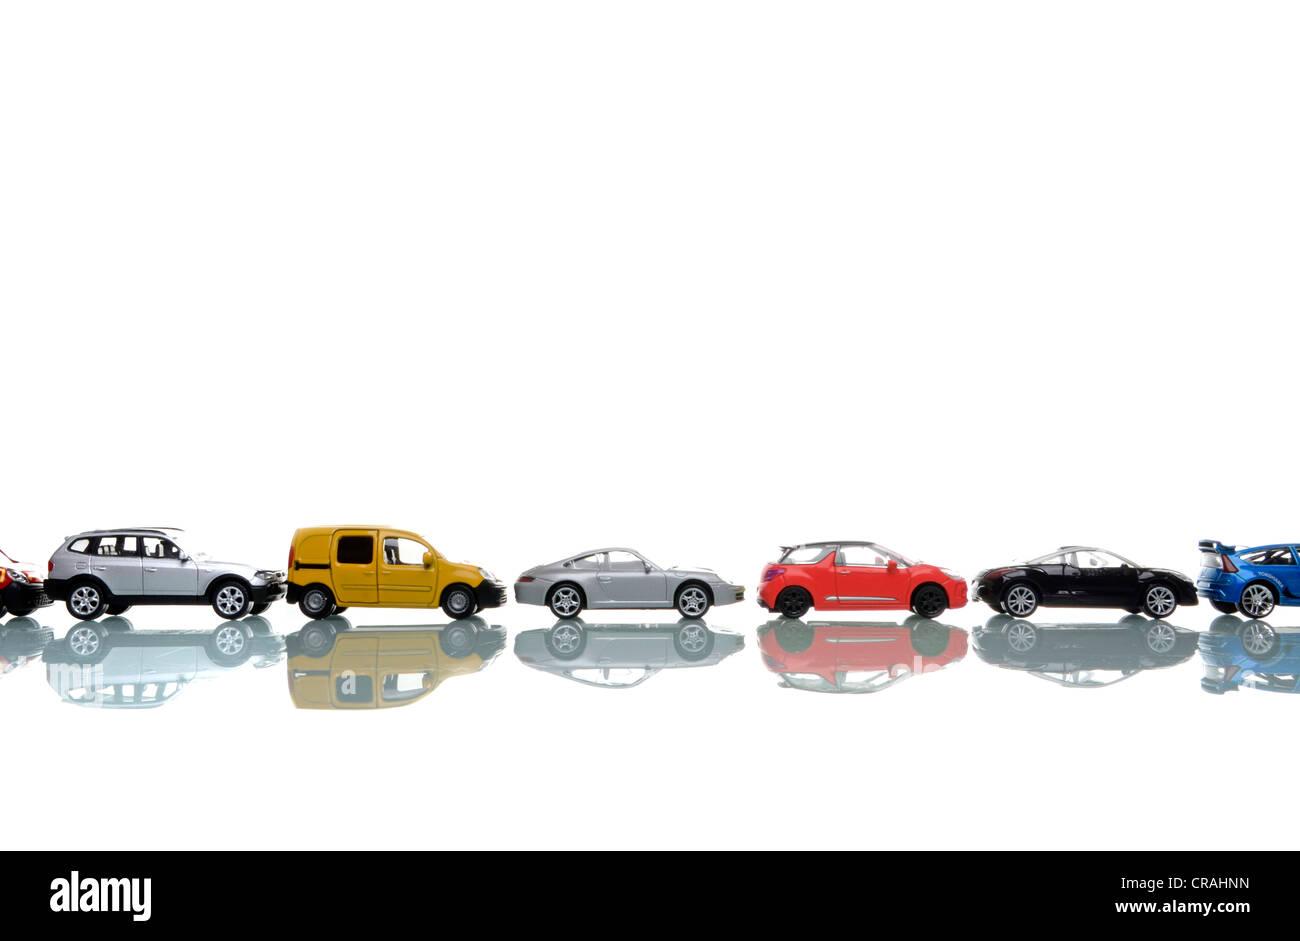 Coches en miniatura en una fila Imagen De Stock